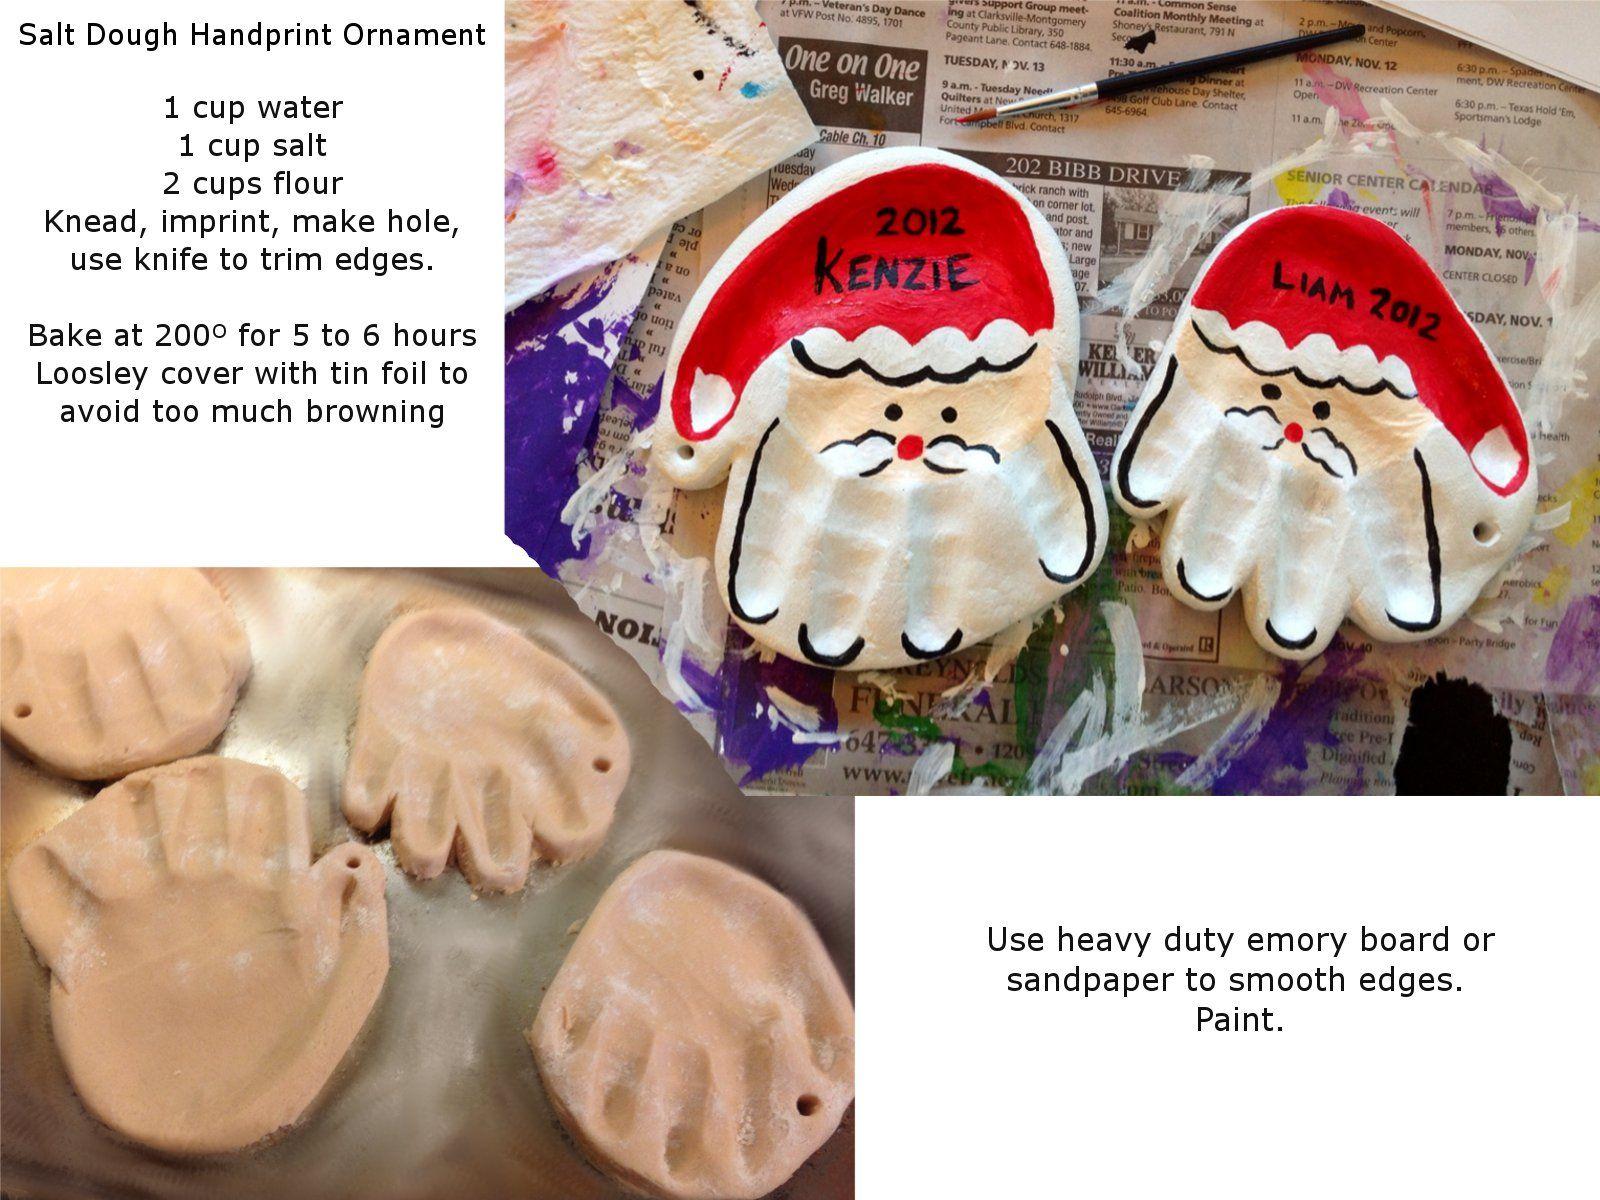 Arts And Crafts Christmas Ideas Part - 37: Salt Dough Handprint Ornament!